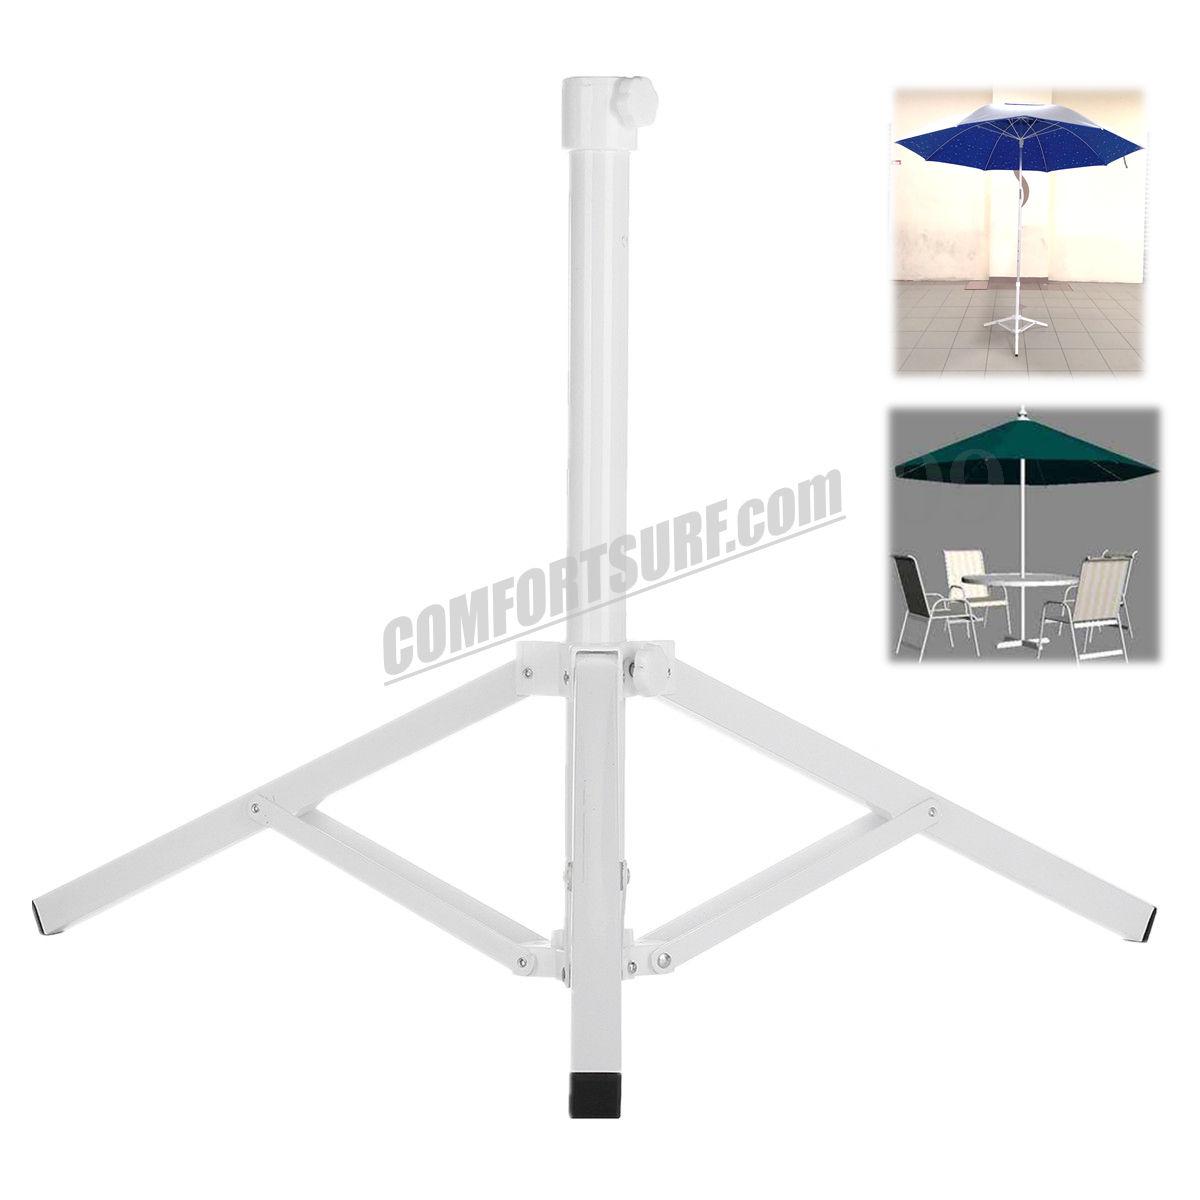 CP017 Metal Steel Adjustable Portable Fishing Sunshade Ground Stand Beach Yard Outdoor Patio Umbrella Stand Base Holder